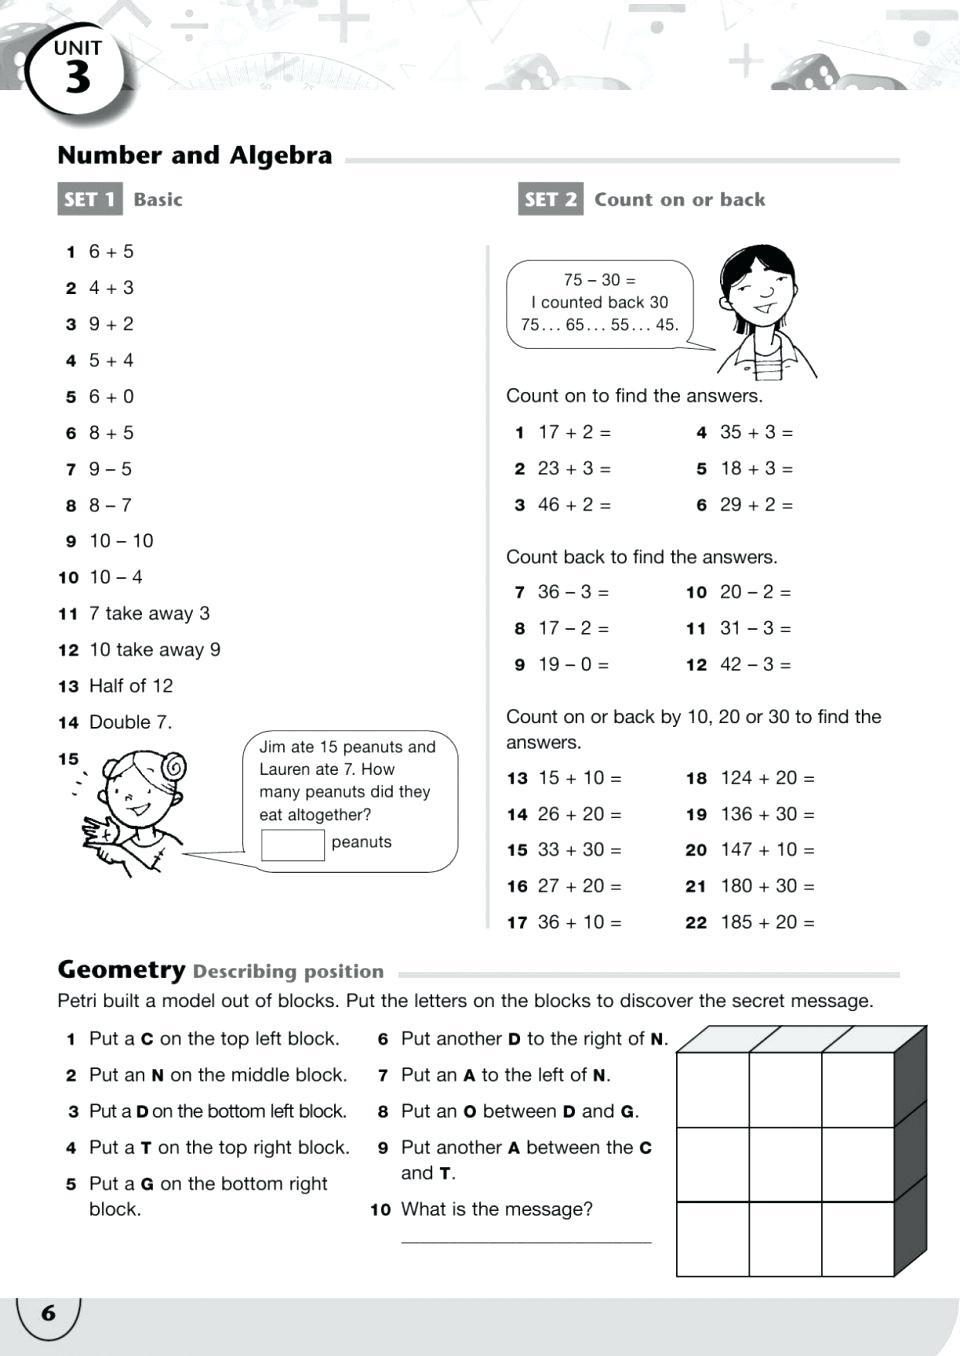 Worksheet : Printable Reading Comprehension Passages Grammar - Free Printable Grammar Worksheets For Highschool Students